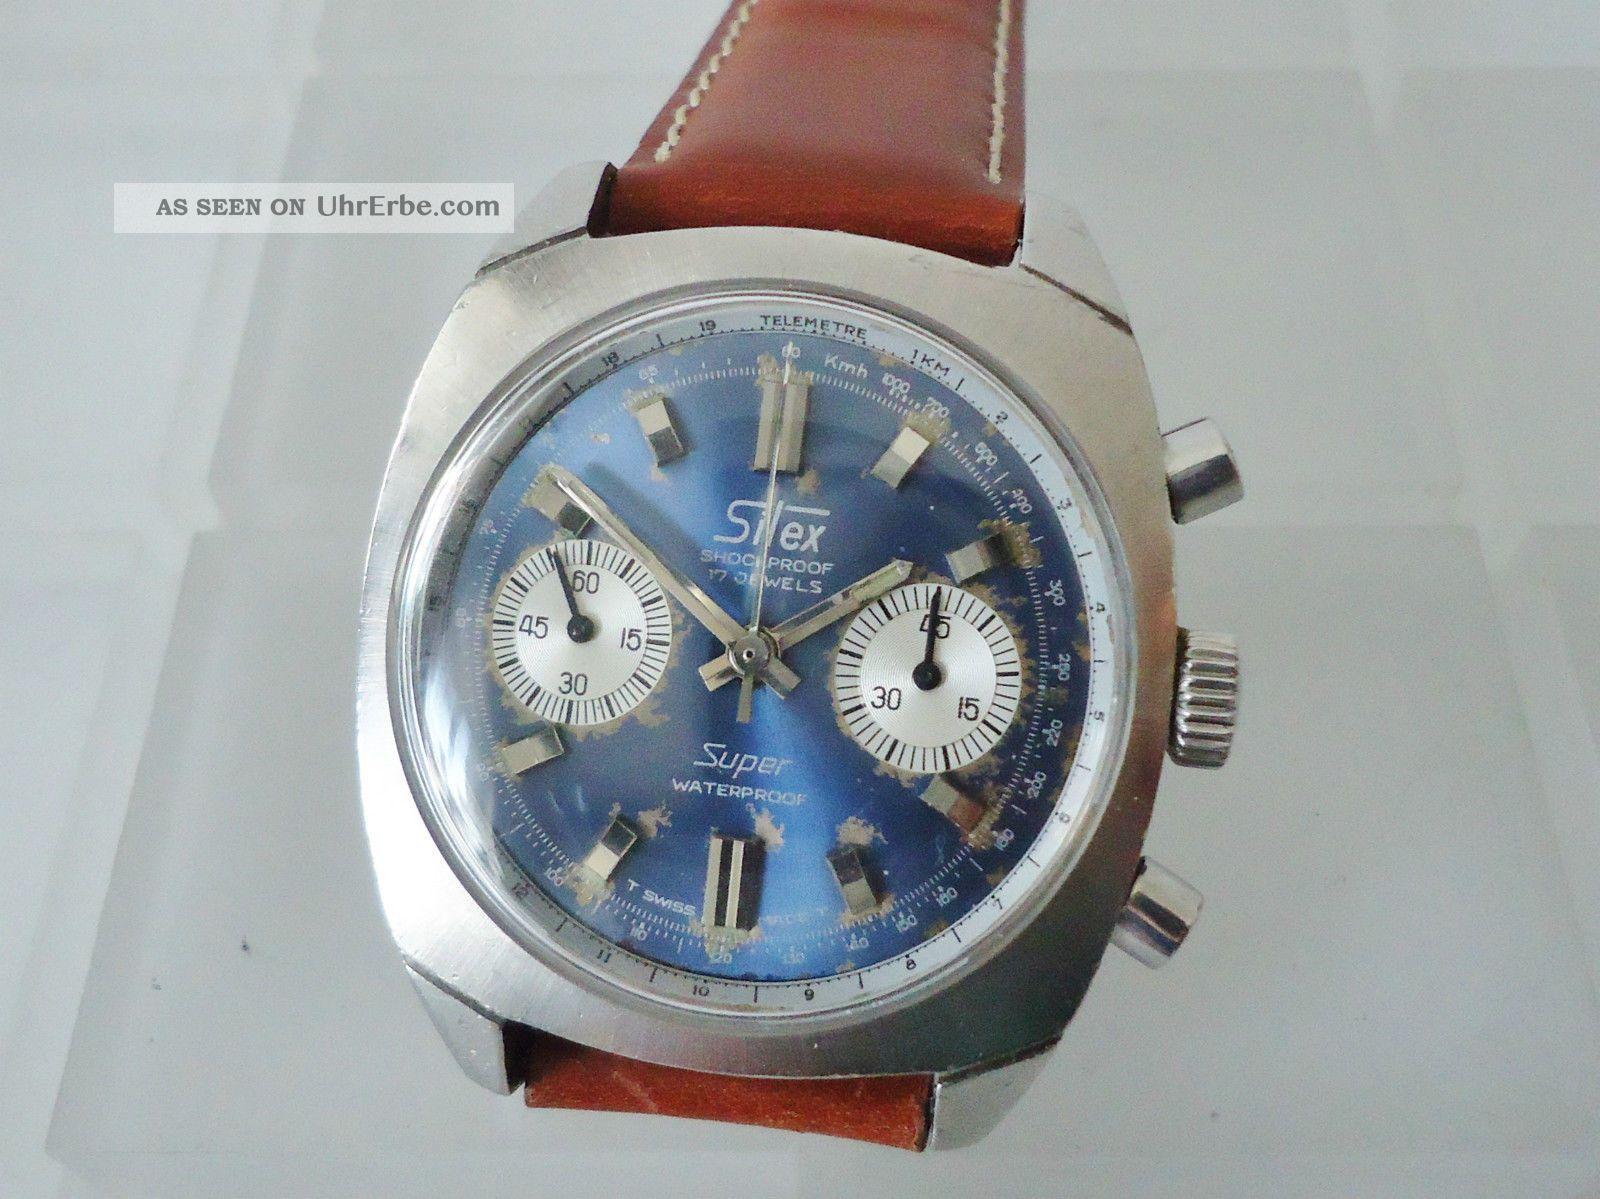 Silex Chronograph Landeron 248 Telemeterskala Armbanduhren Bild